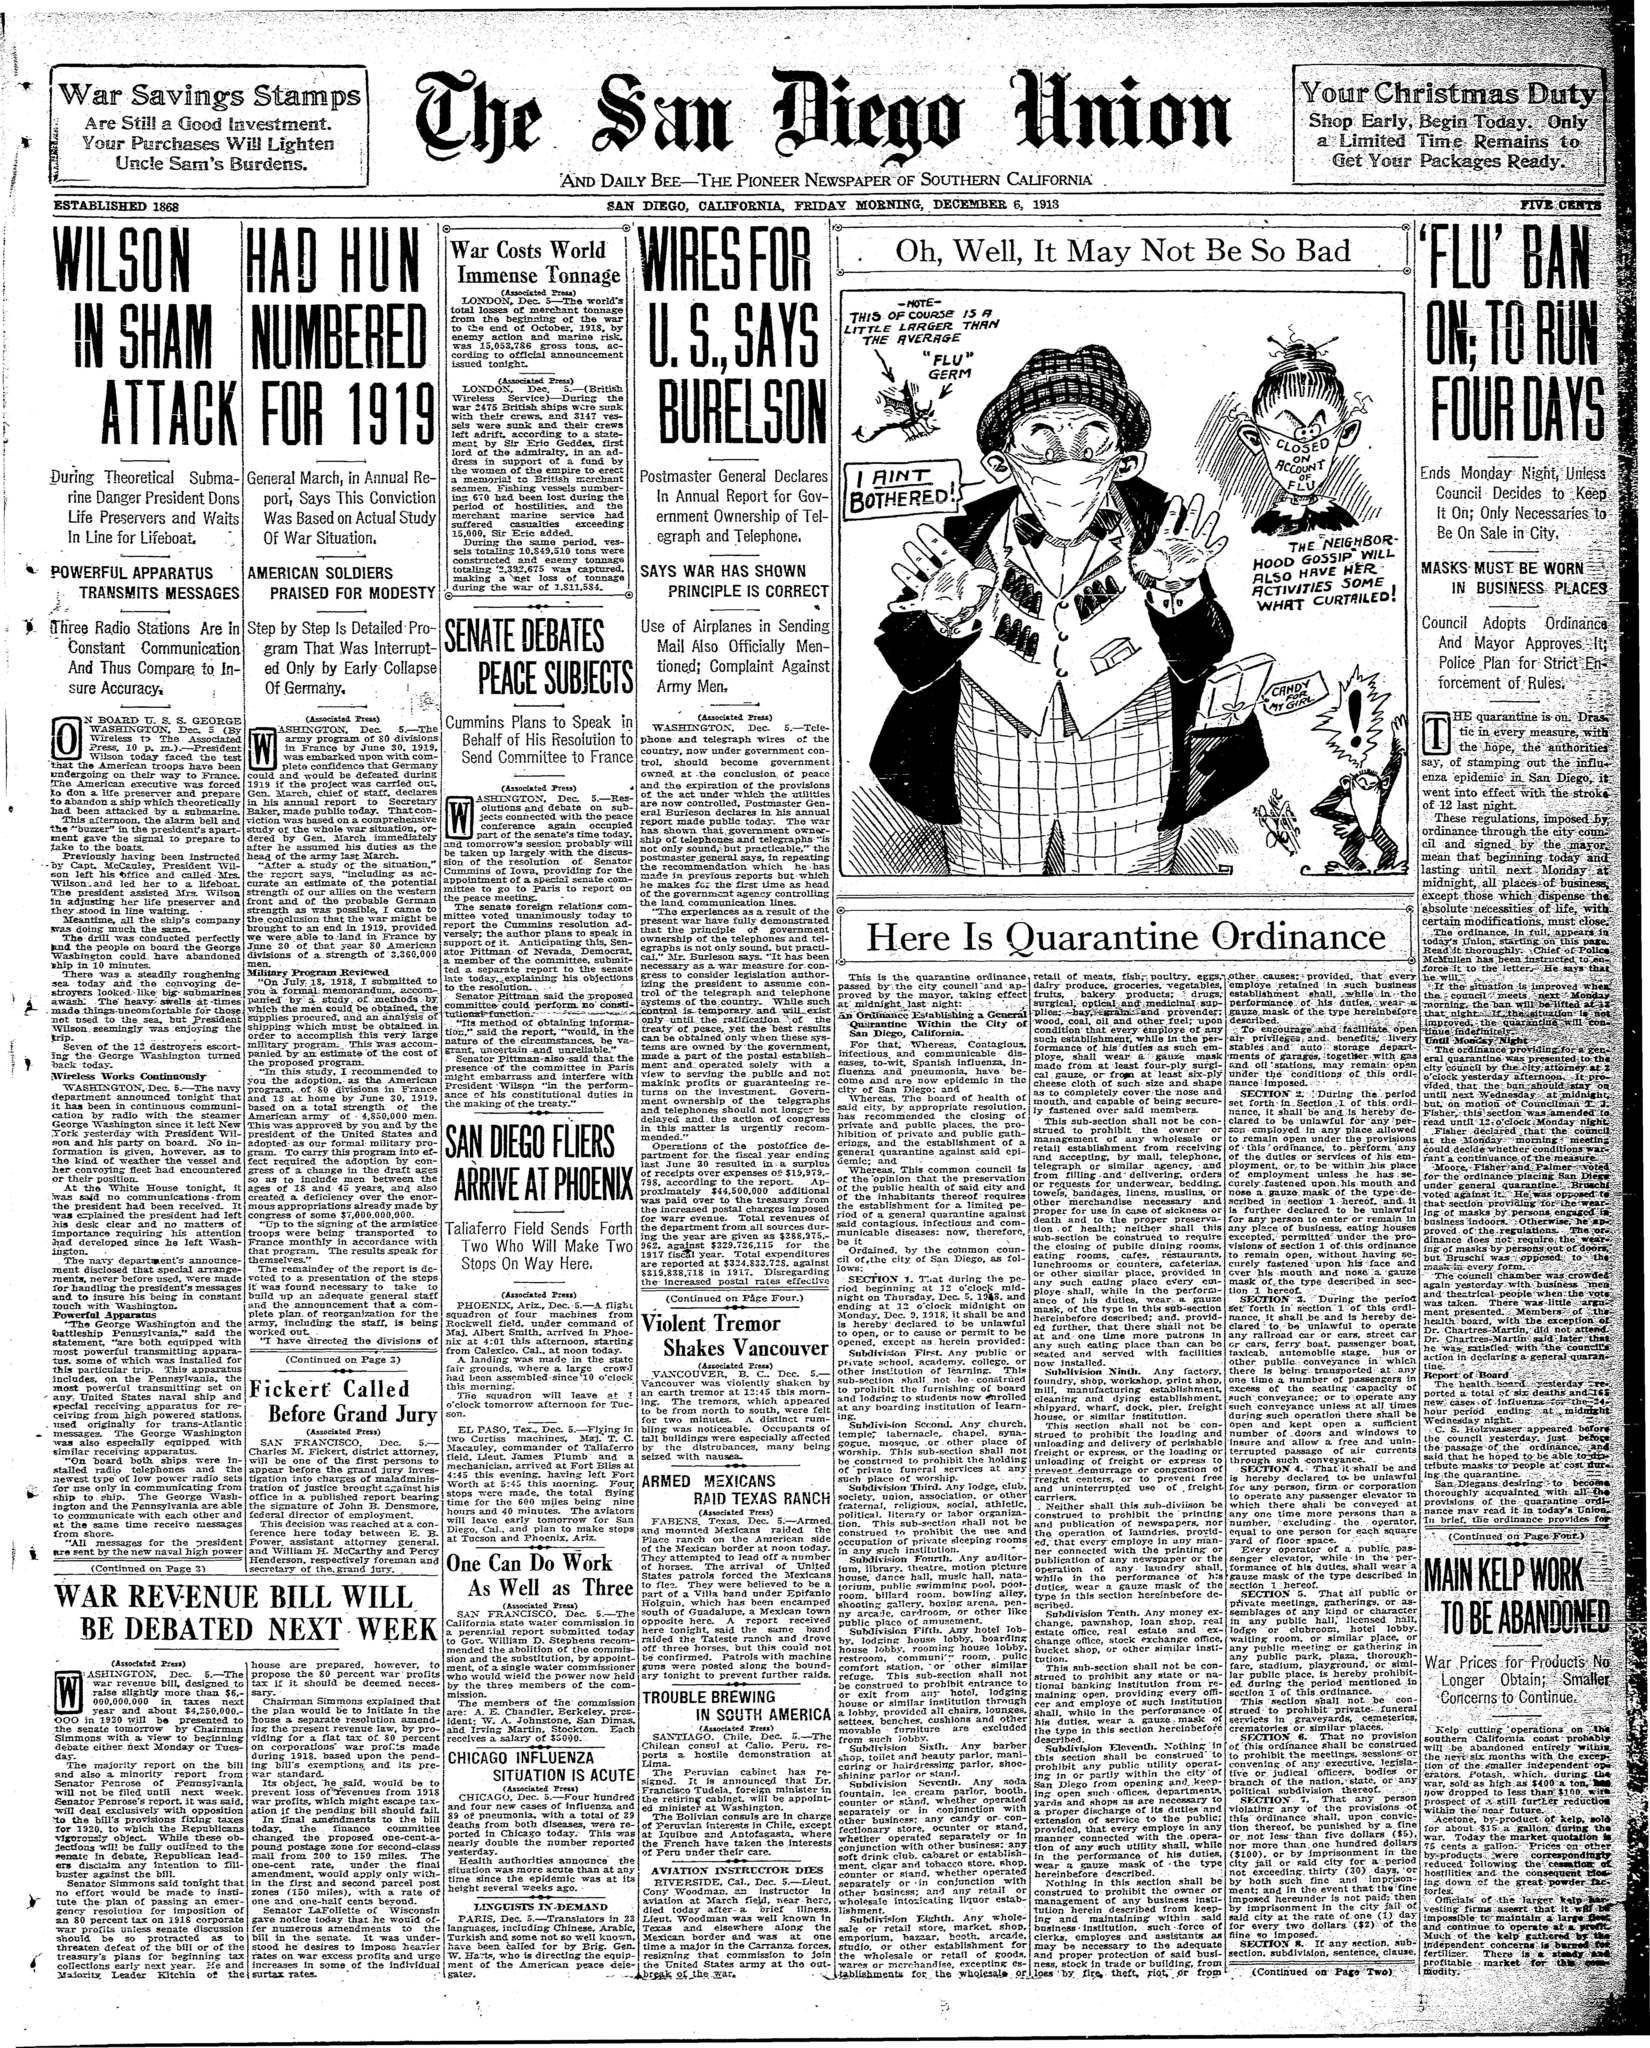 December 6, 1918